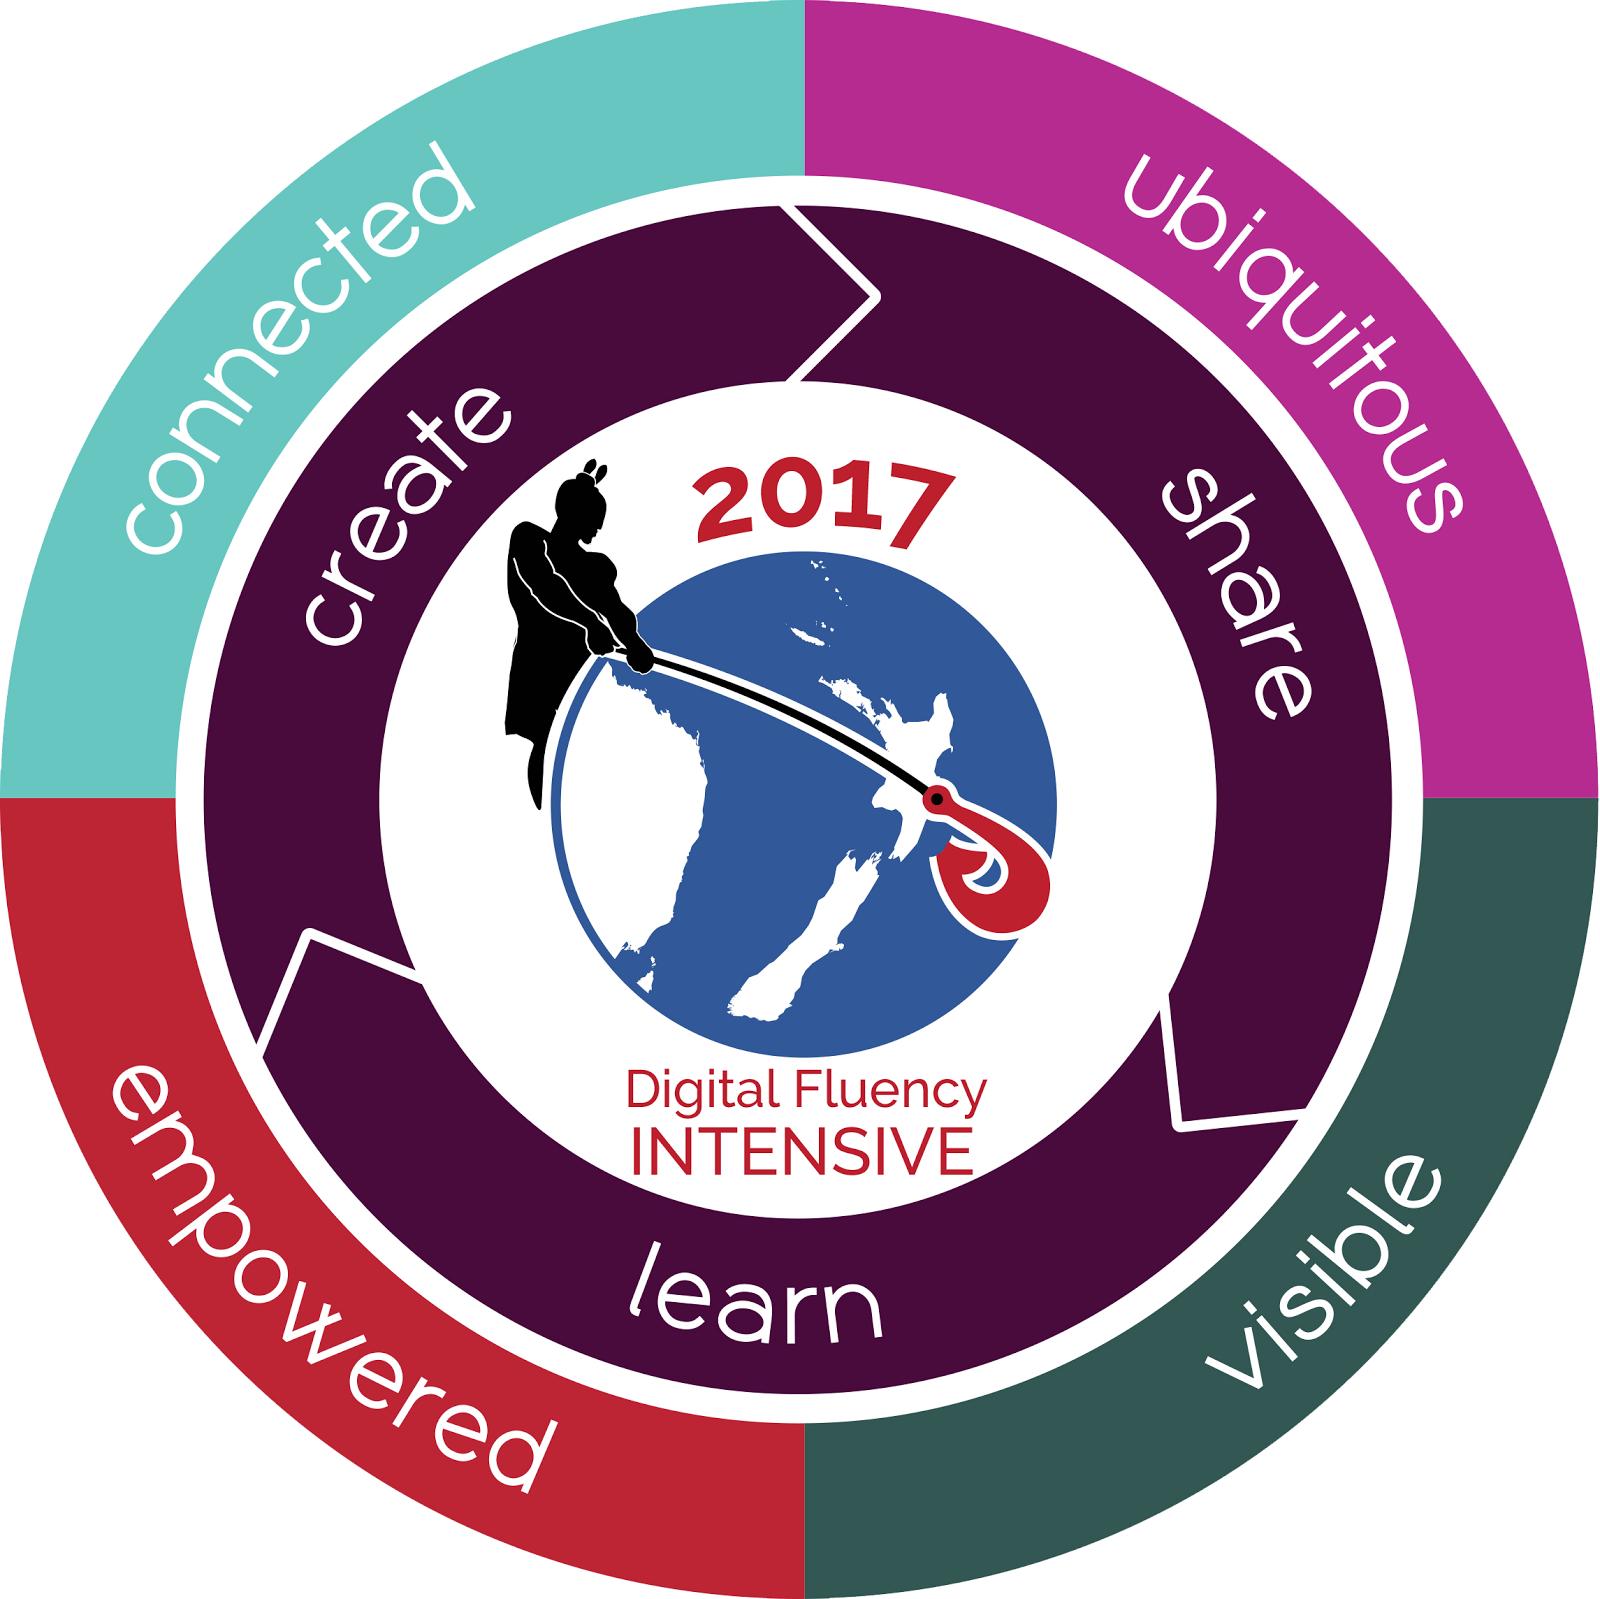 Manaiakalani Digital Fluency Intensive 2017